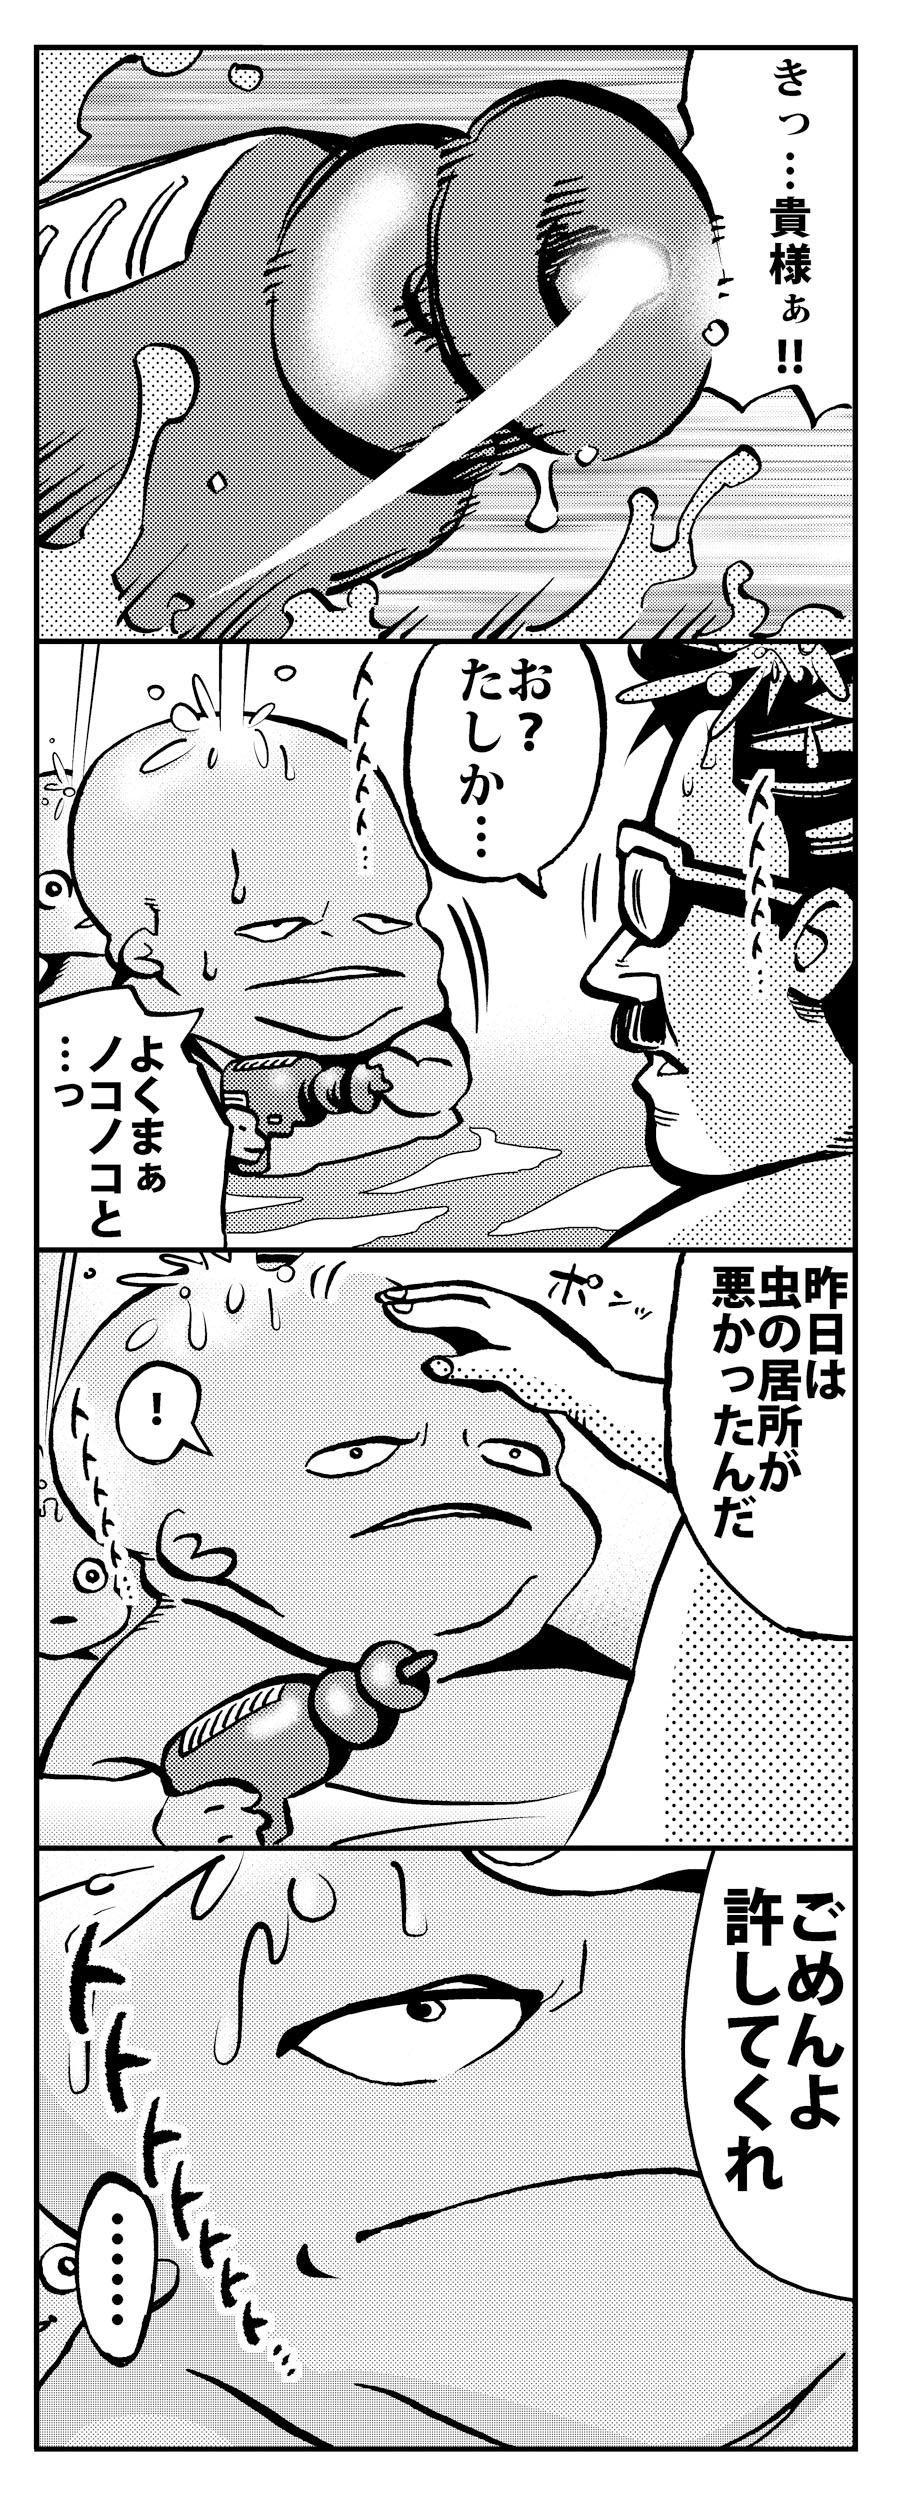 hippseijin_manga_02_06